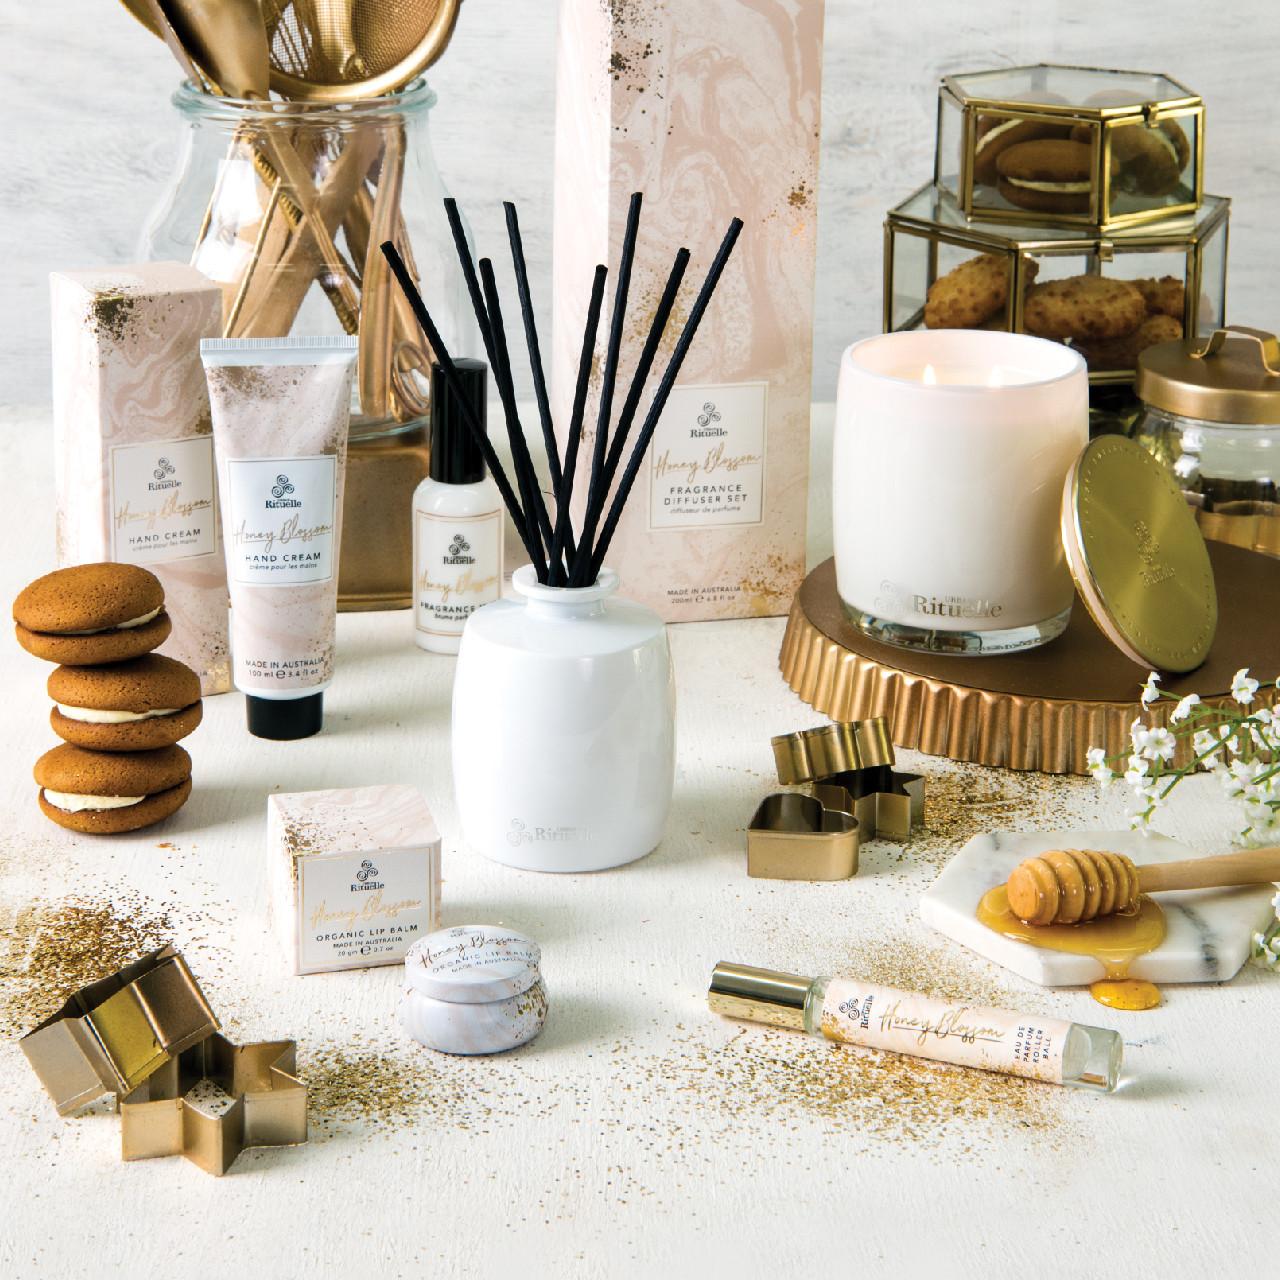 Sweet Treats - Honey Blossom - Sweet Delights Gift Set - Urban Rituelle